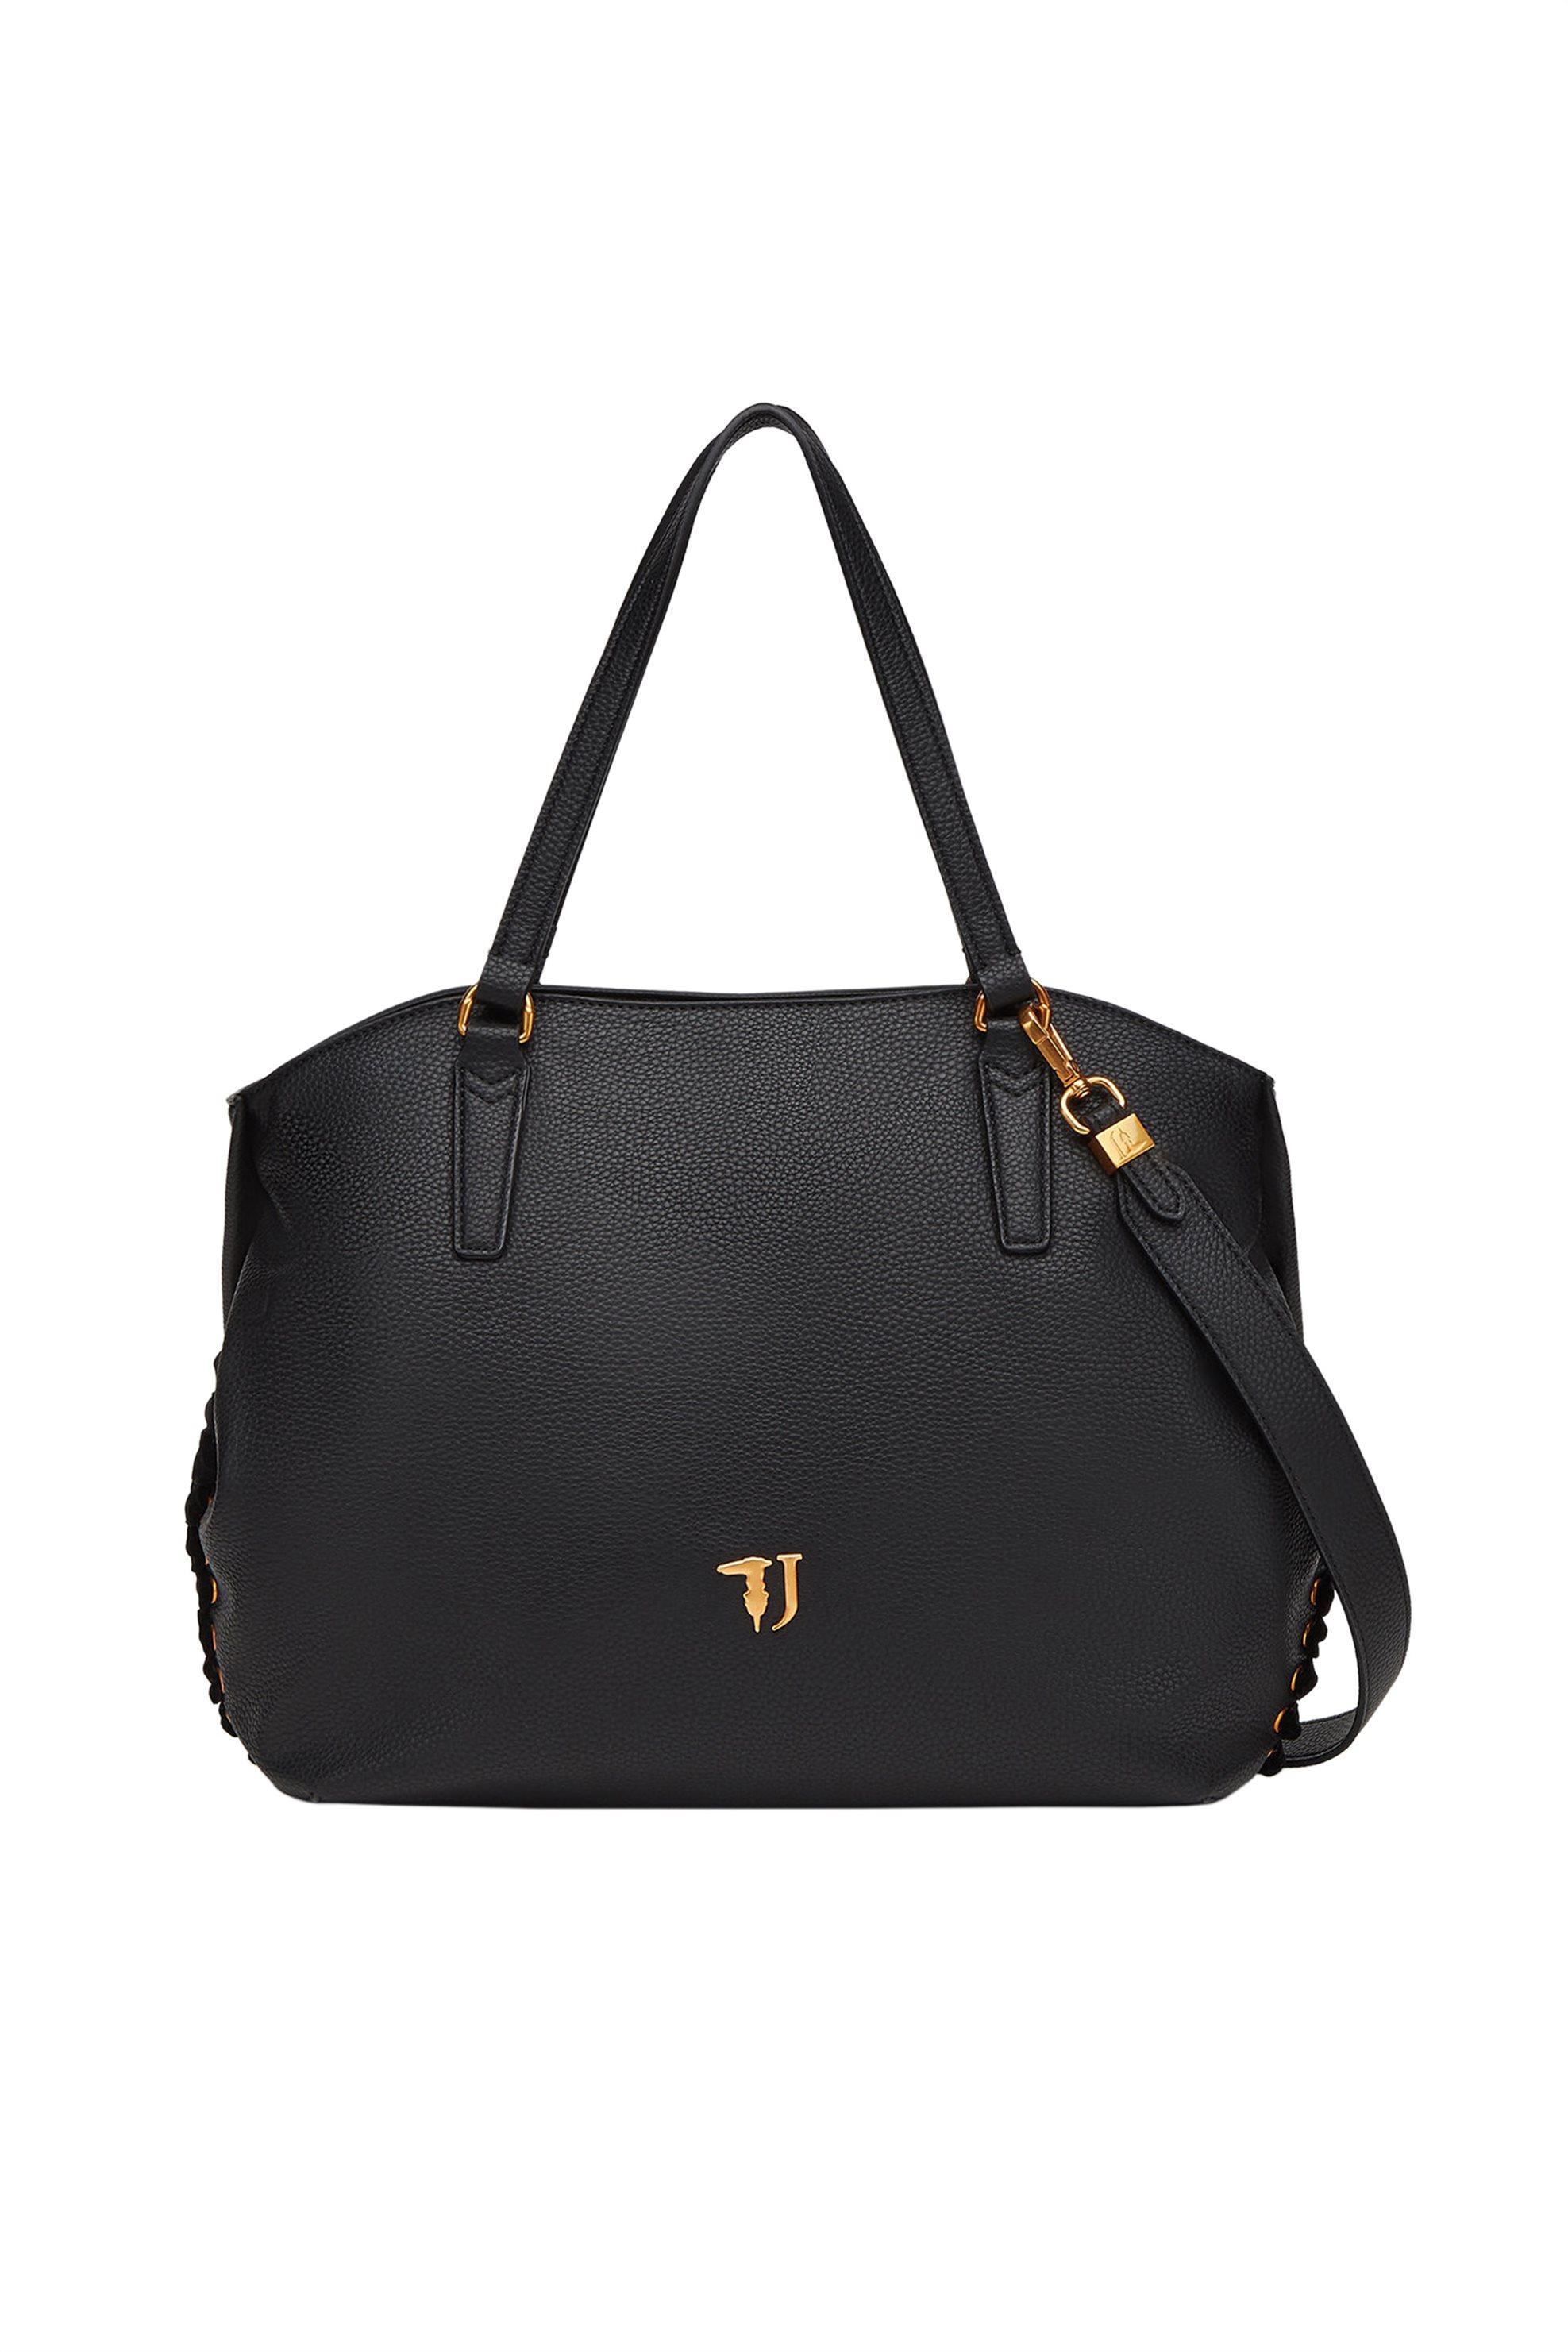 Trussardi Jeans γυναικεία τσάντα ώμου με βελούδινη κορδέλα Lavanda - 75B00447-9Y γυναικα   τσαντεσ   ώμου   shopper bags